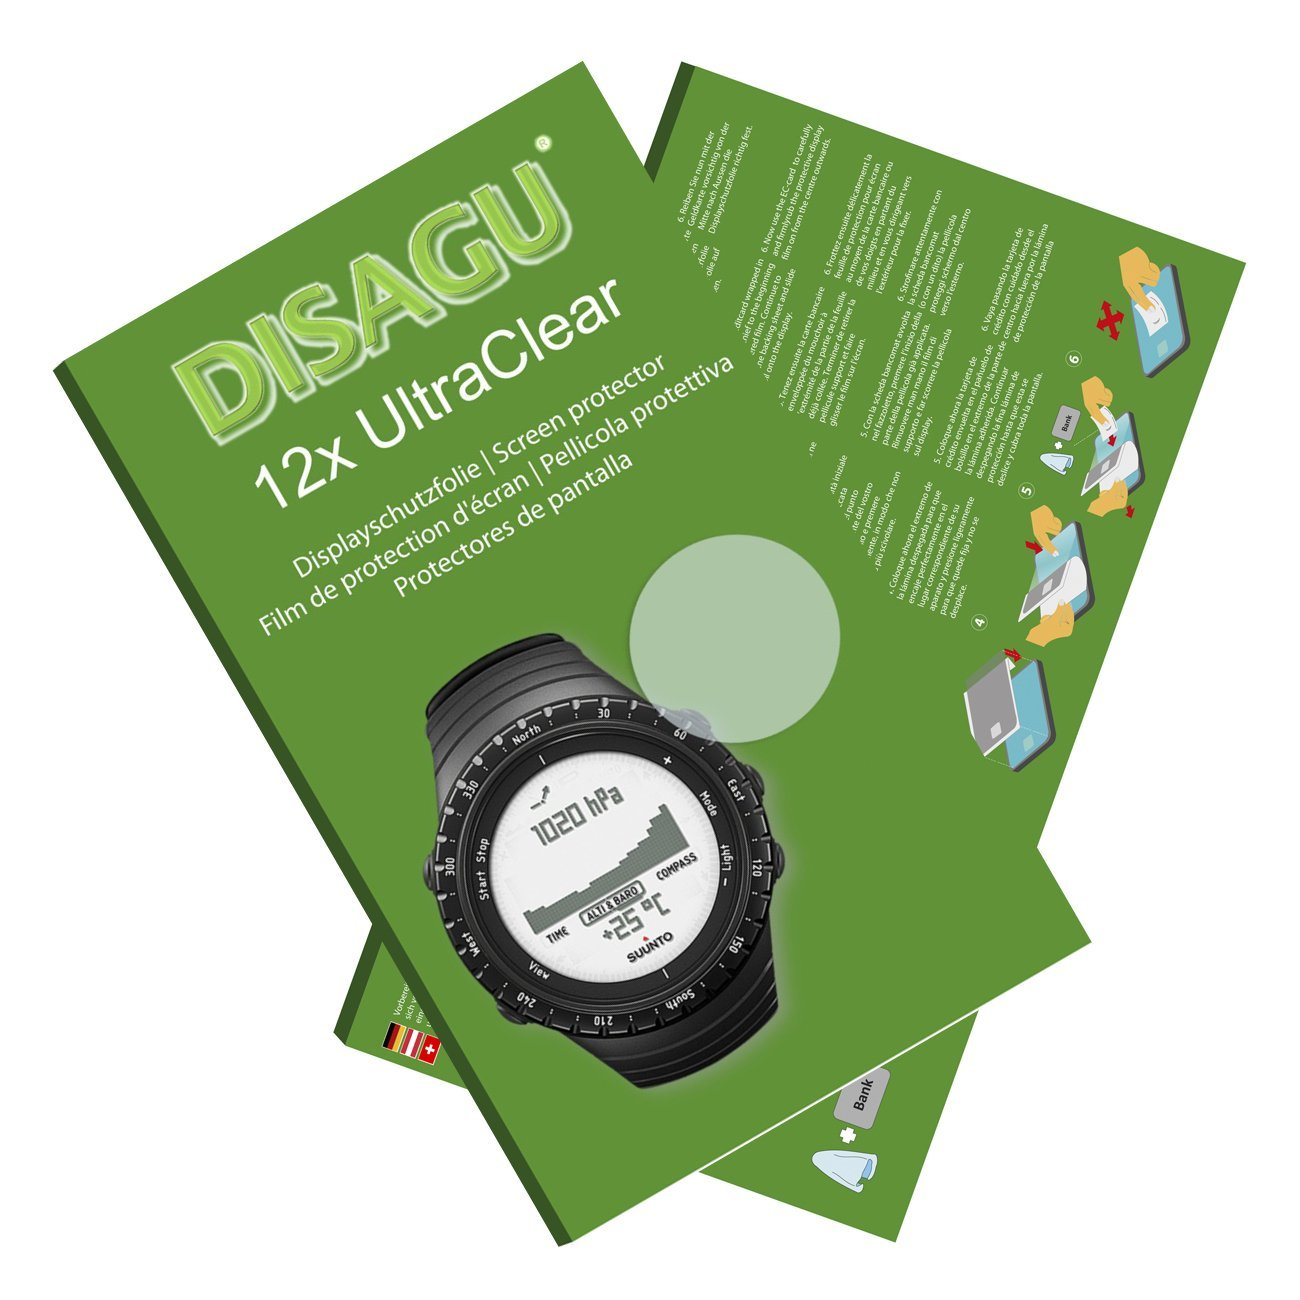 DISAGU 12x Ultra Clear Screen Protector for Suunto Core Regular Black